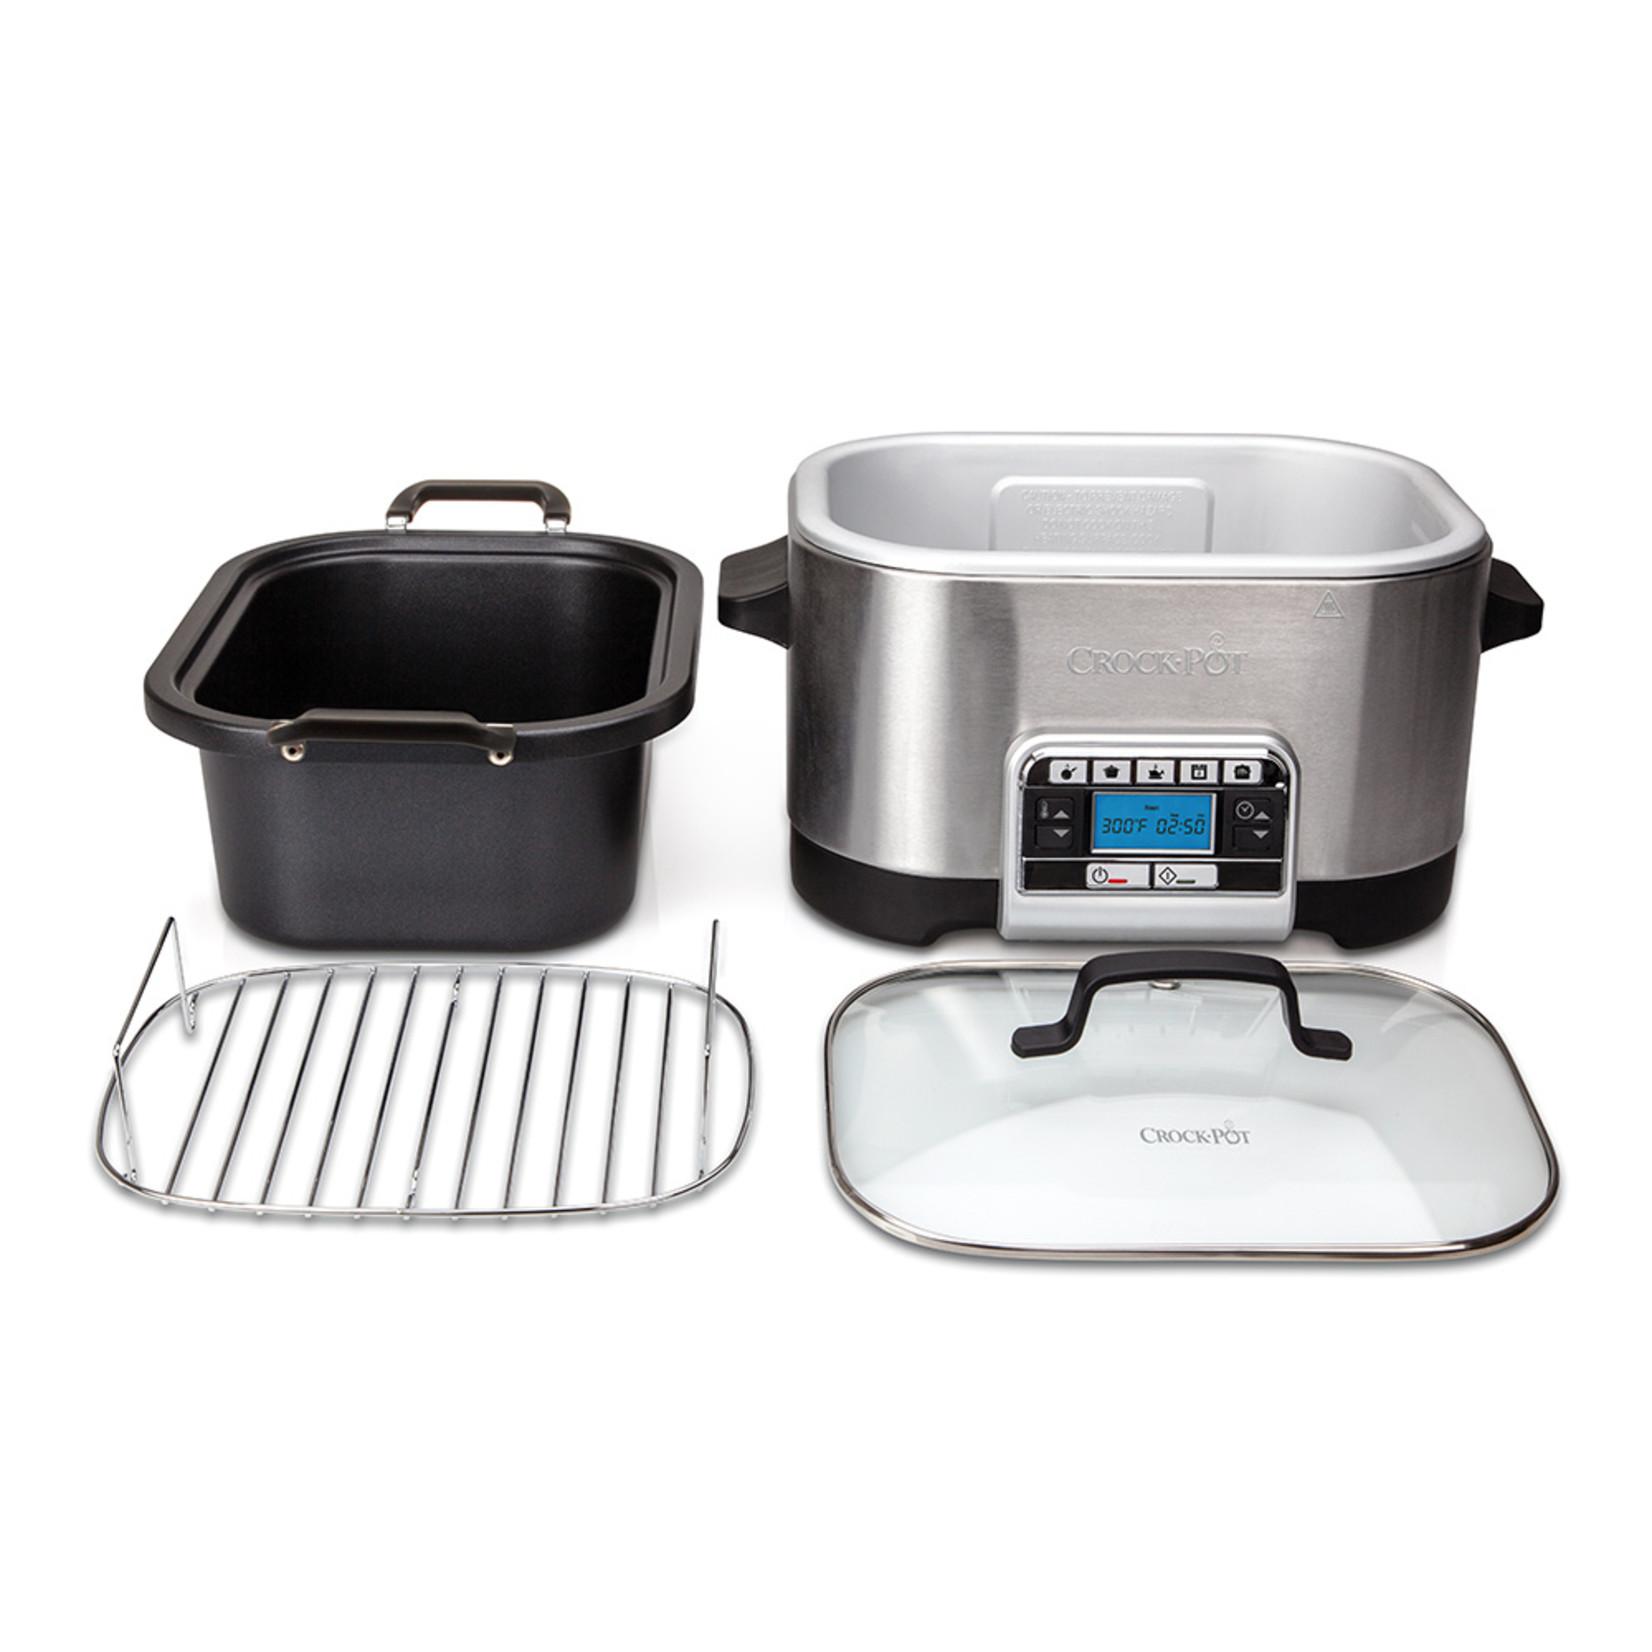 Crock-Pot Crock-Pot CR024 slow en multi cooker 5,6L